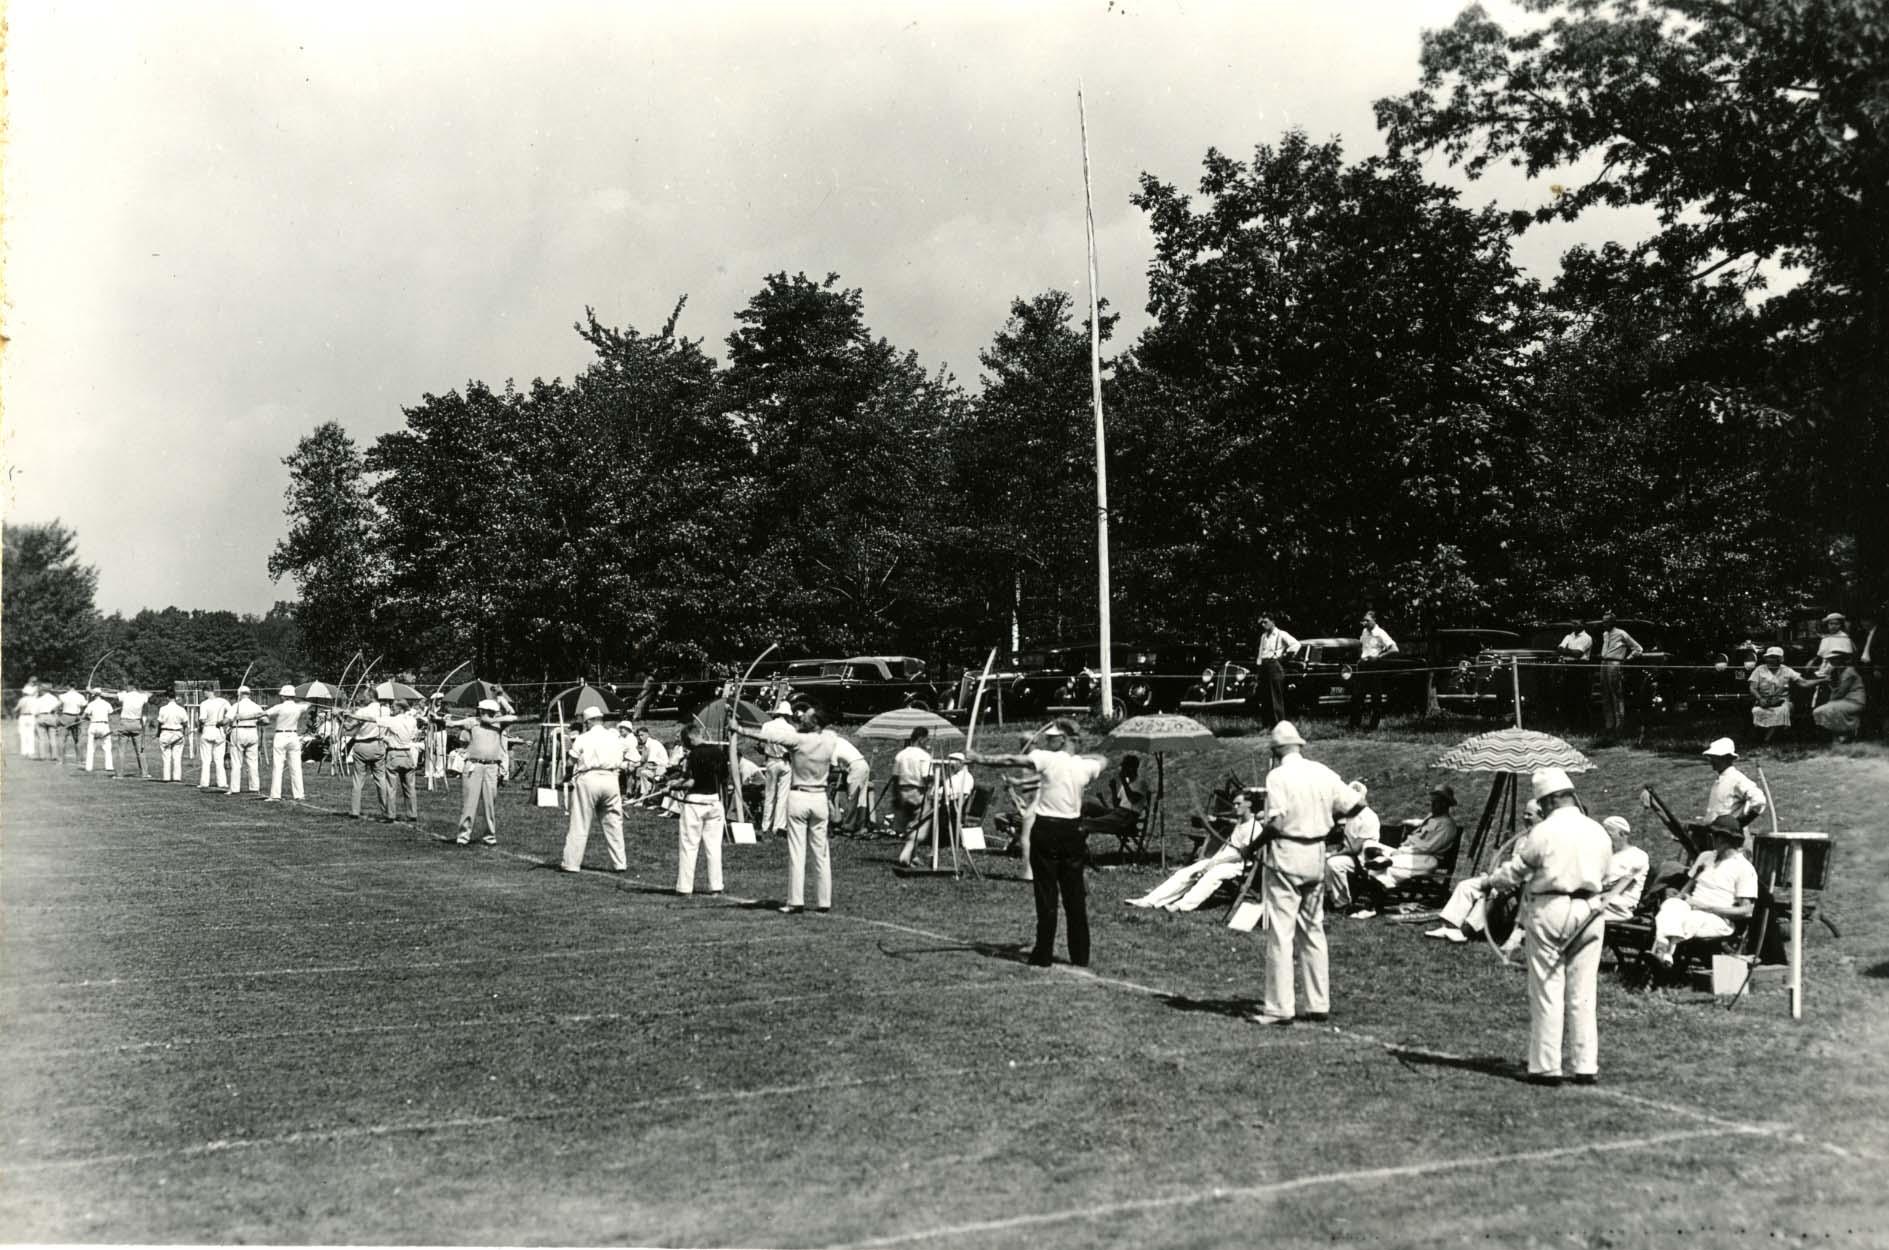 National Archery Tournament, Storrs, CT, 1934